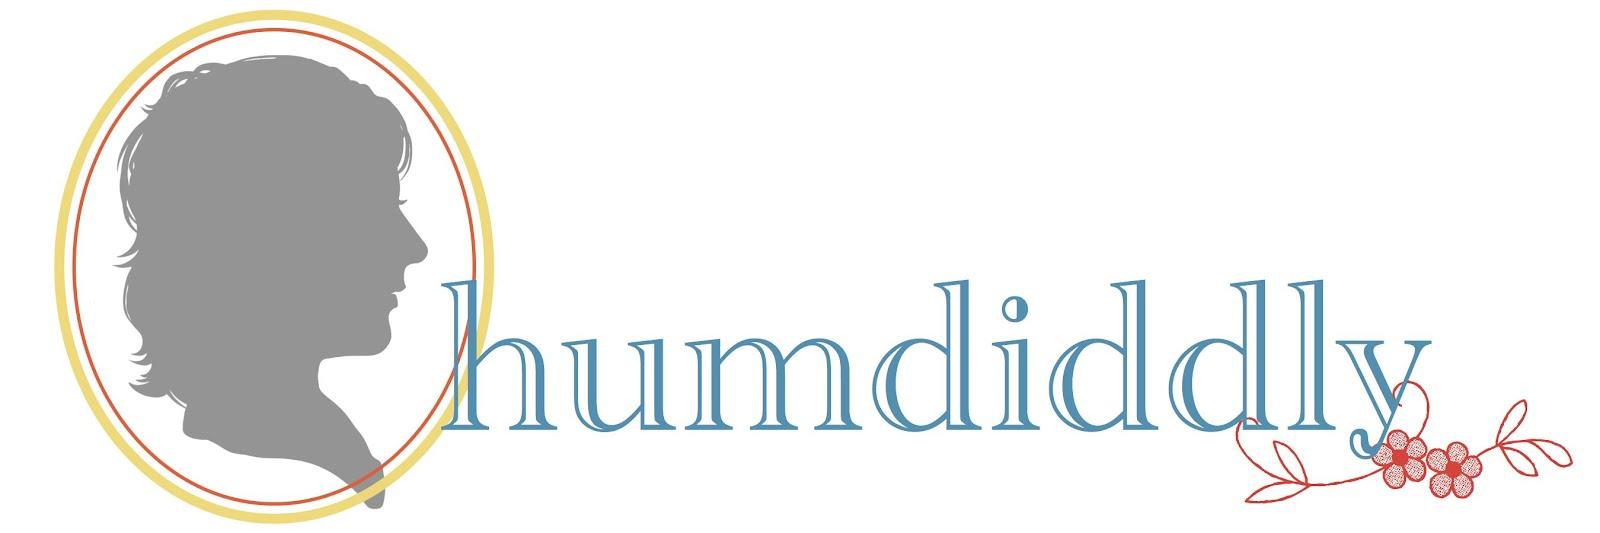 hohumdiddly